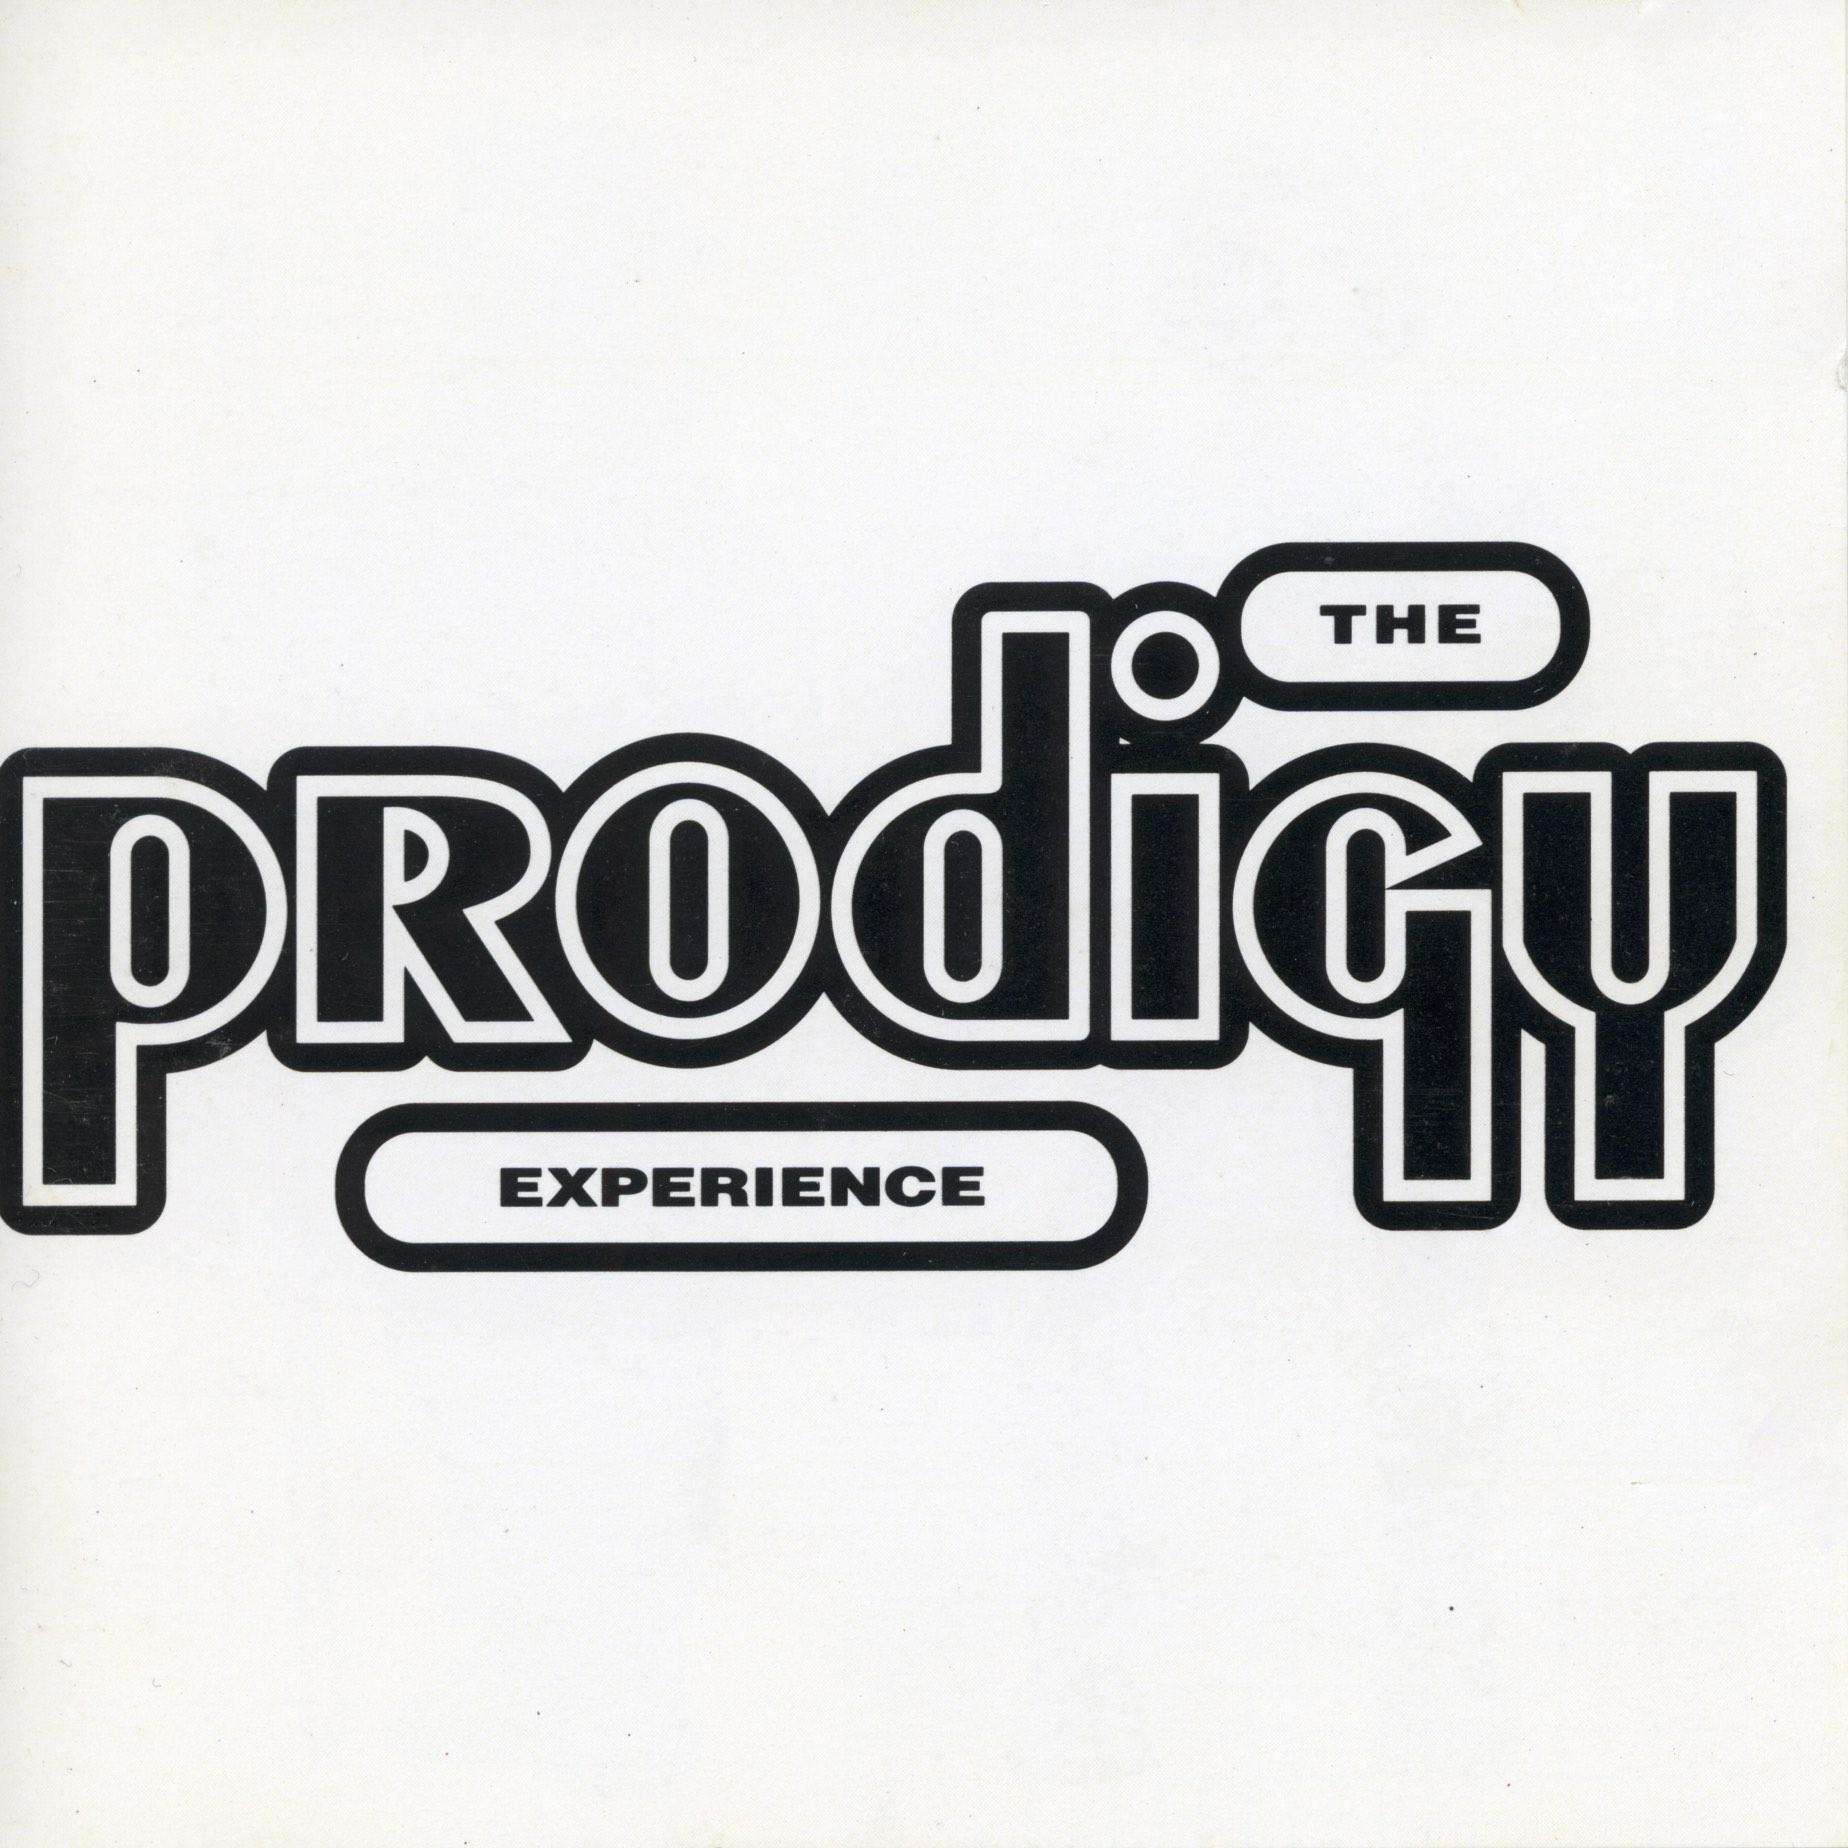 1994 - The Prodigy